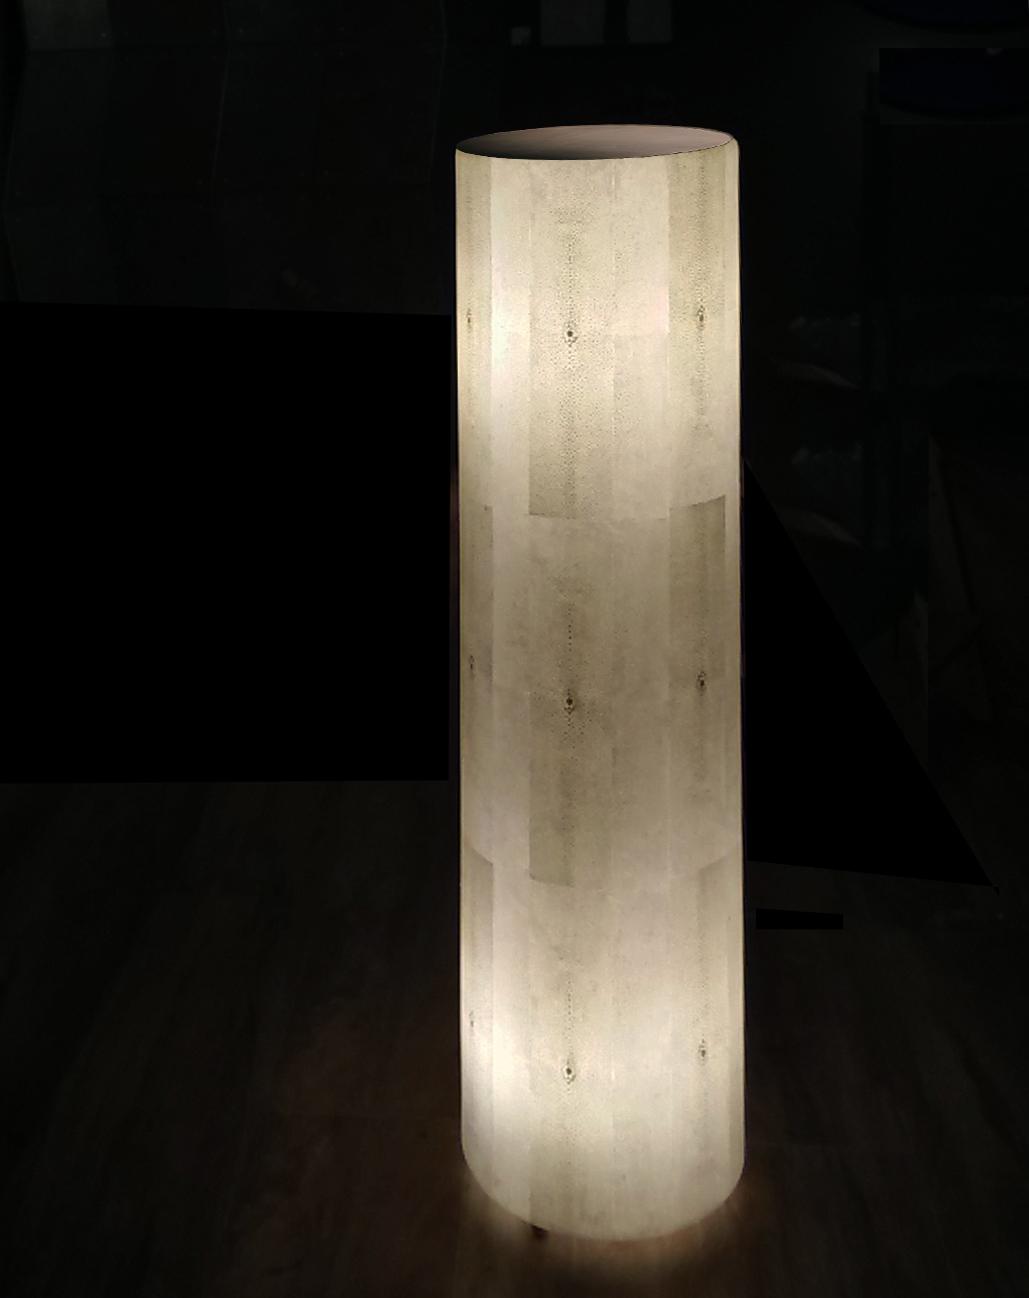 Dimension 100 x 25 cm